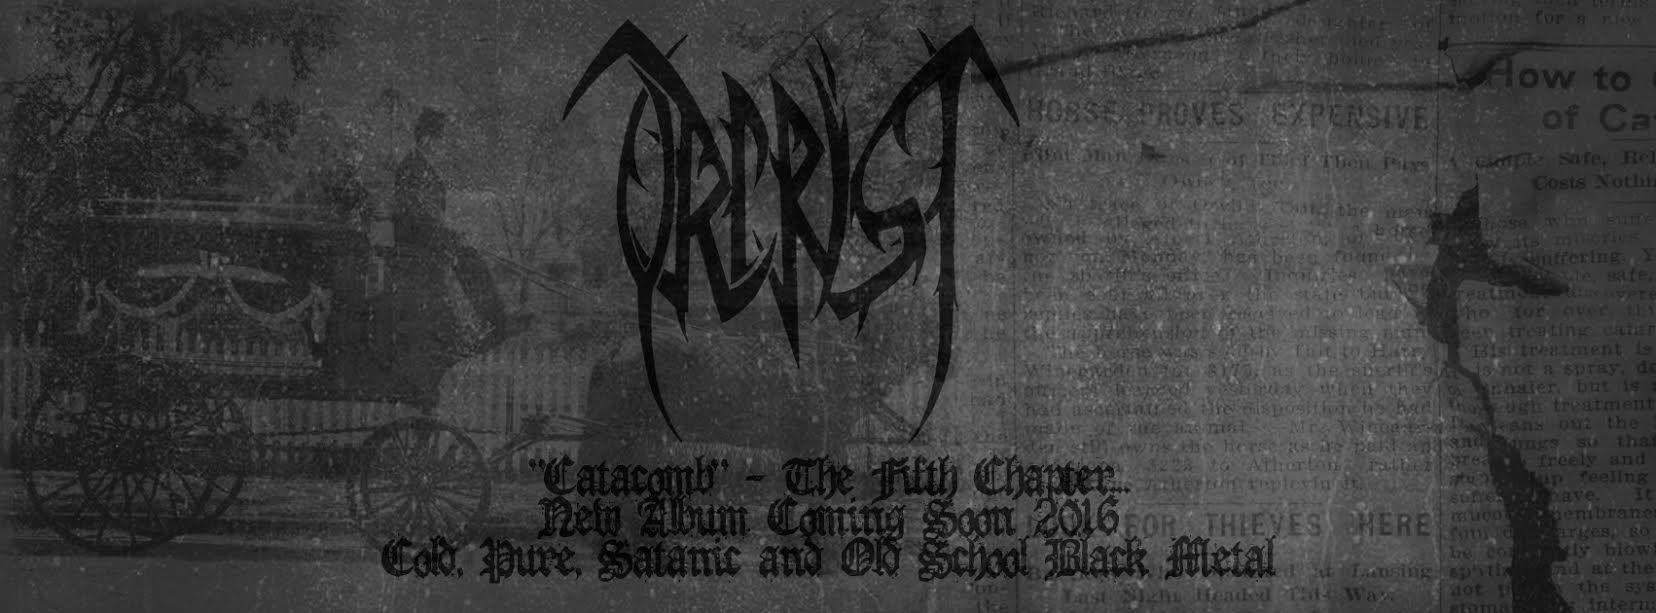 orcrist